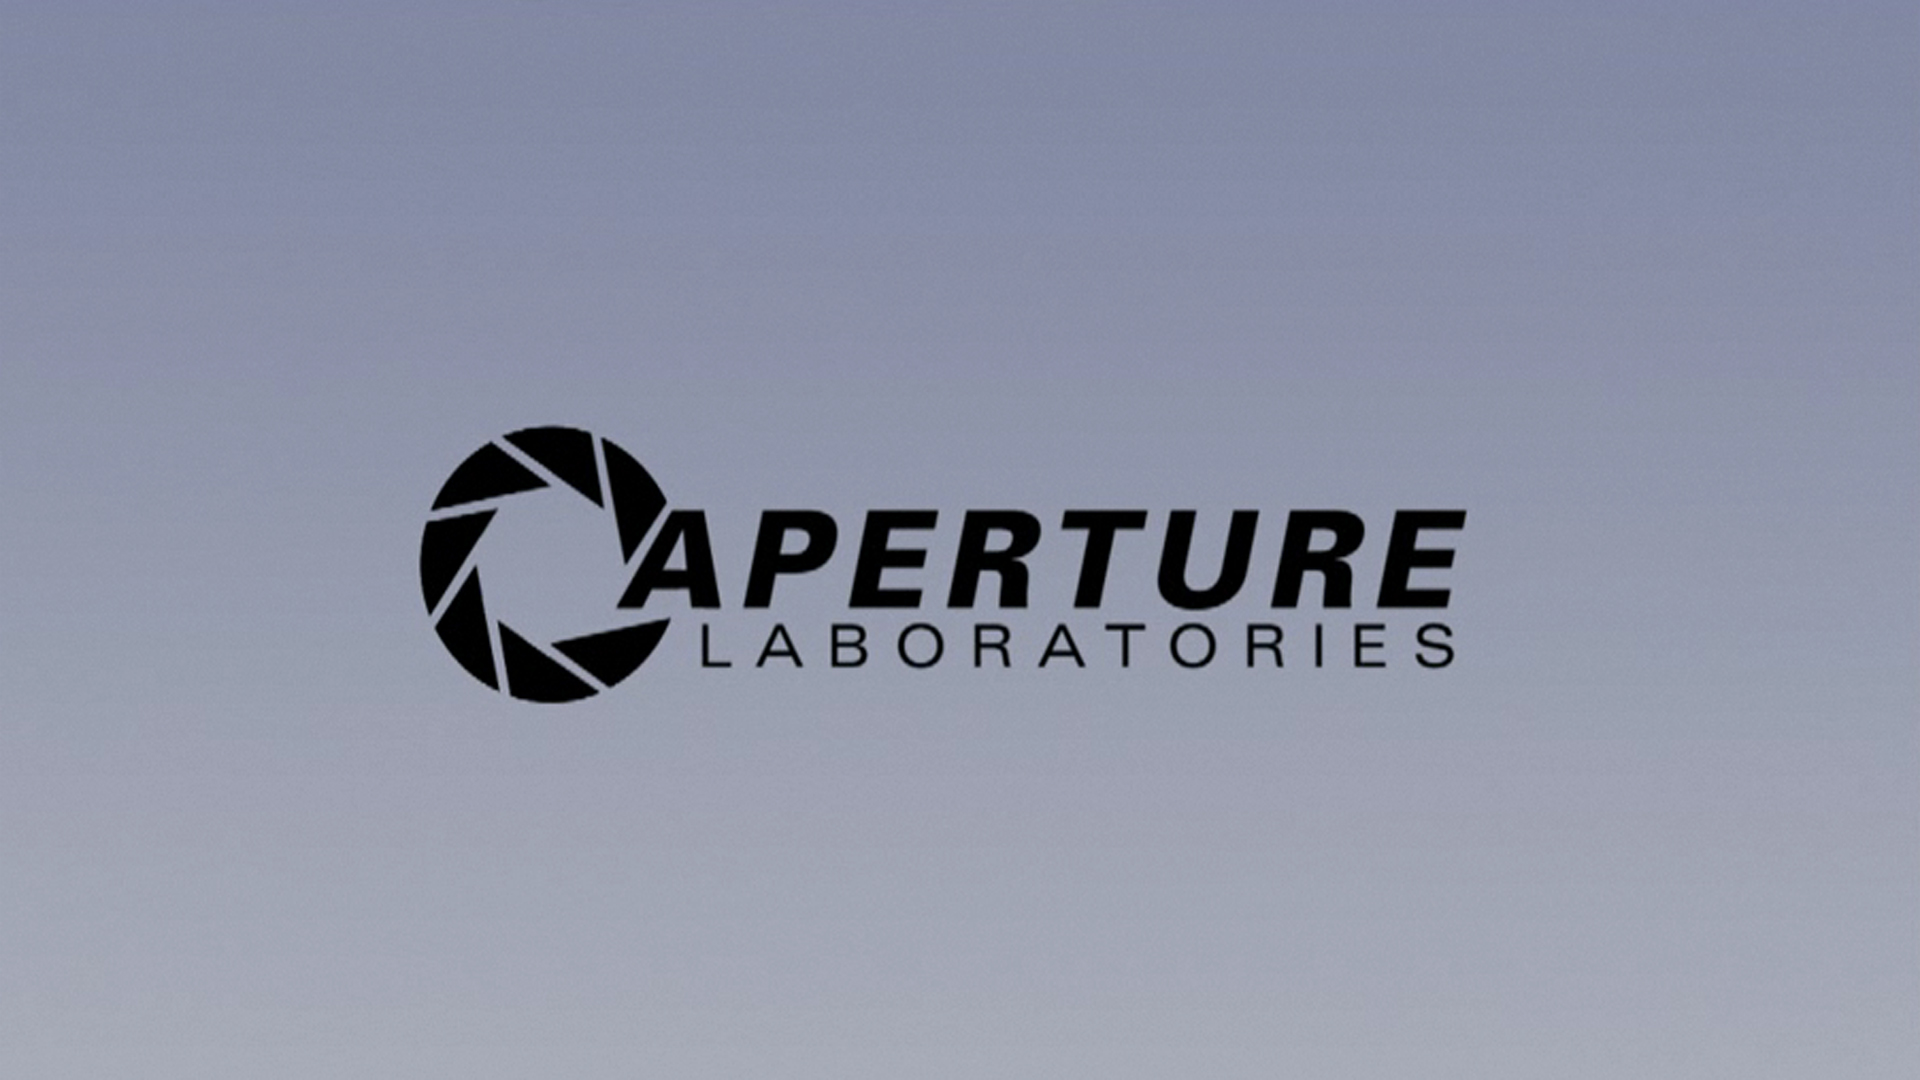 wallpaper portal background wallpapaer laboratories aperture 1920x1080